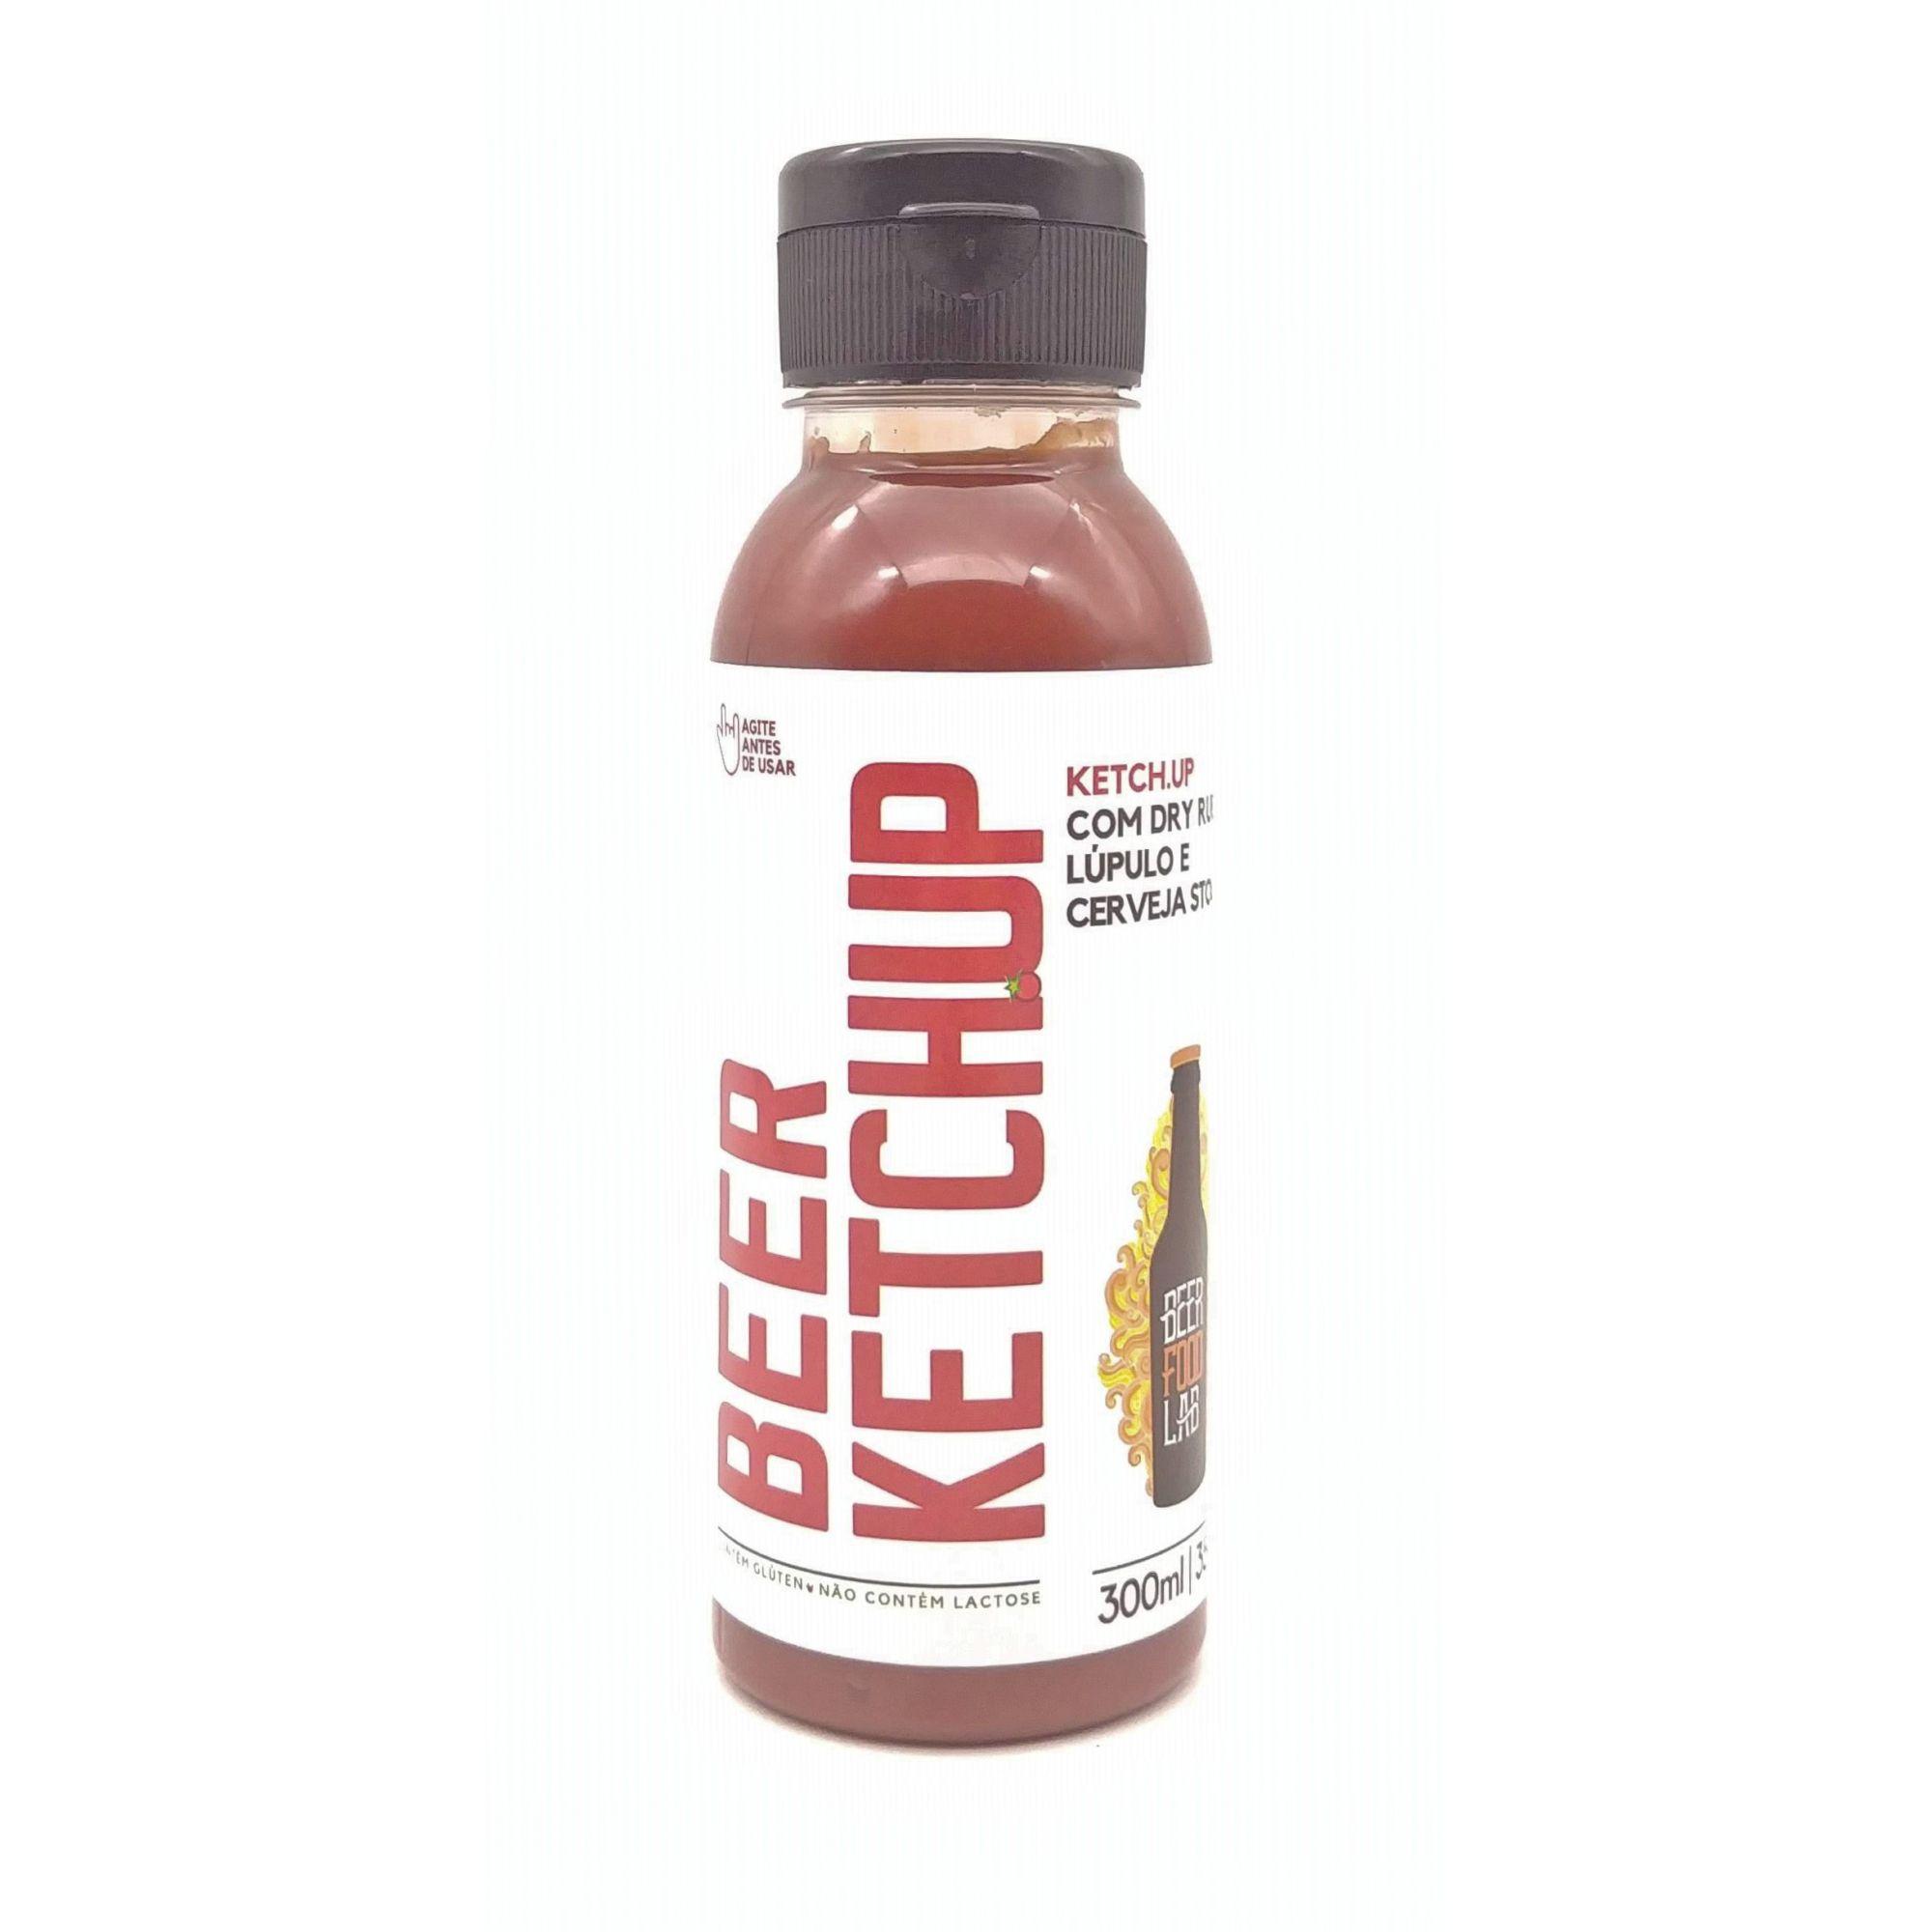 BEER KETCHUP - Ketchup com Dry Rub, Lúpulo e Cerveja Stout 300ml